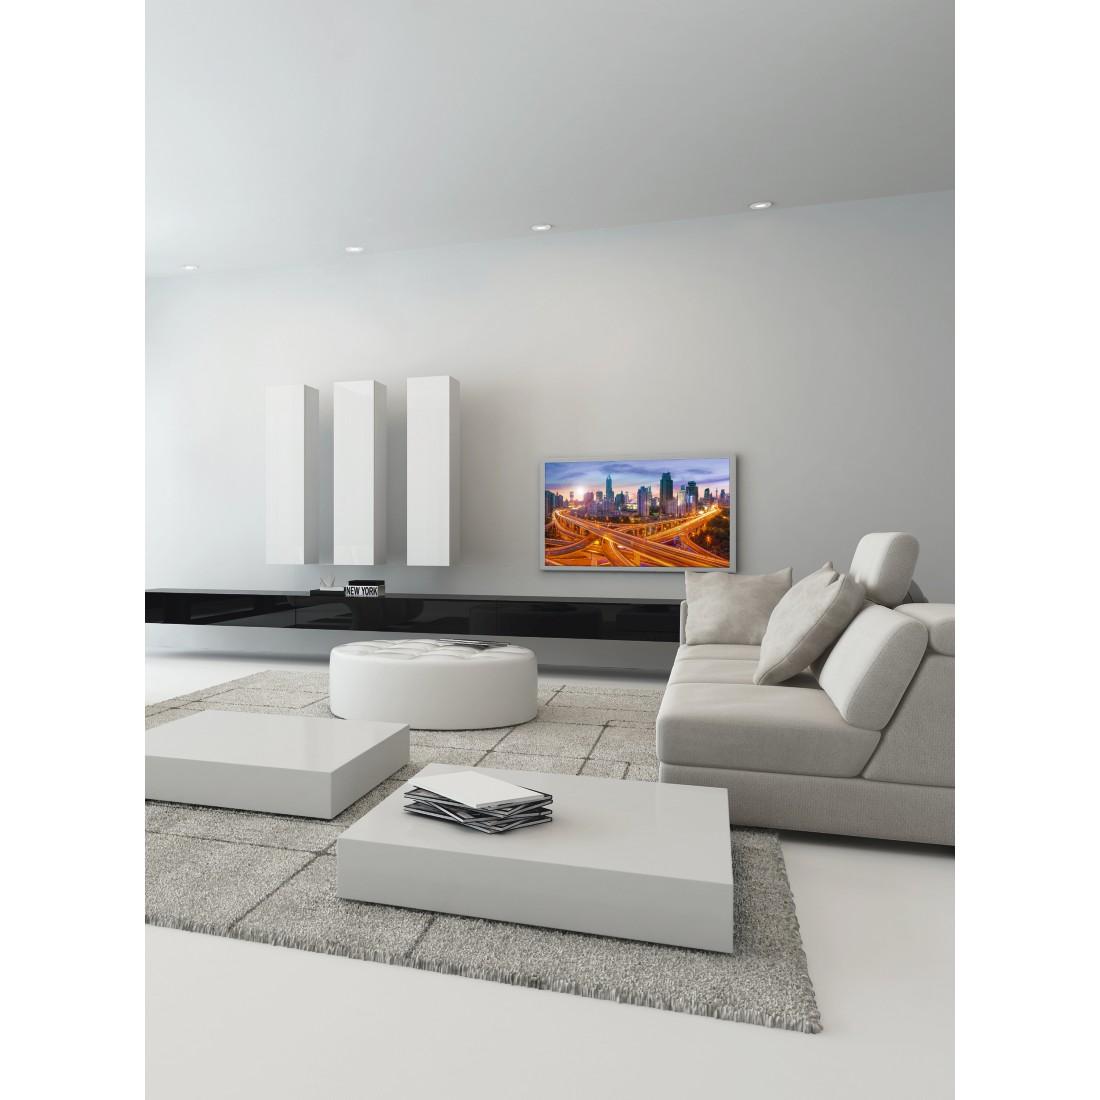 00118054 hama tv wandhalterung fix premium vesa 400x400 165 cm 65 schwarz hama. Black Bedroom Furniture Sets. Home Design Ideas